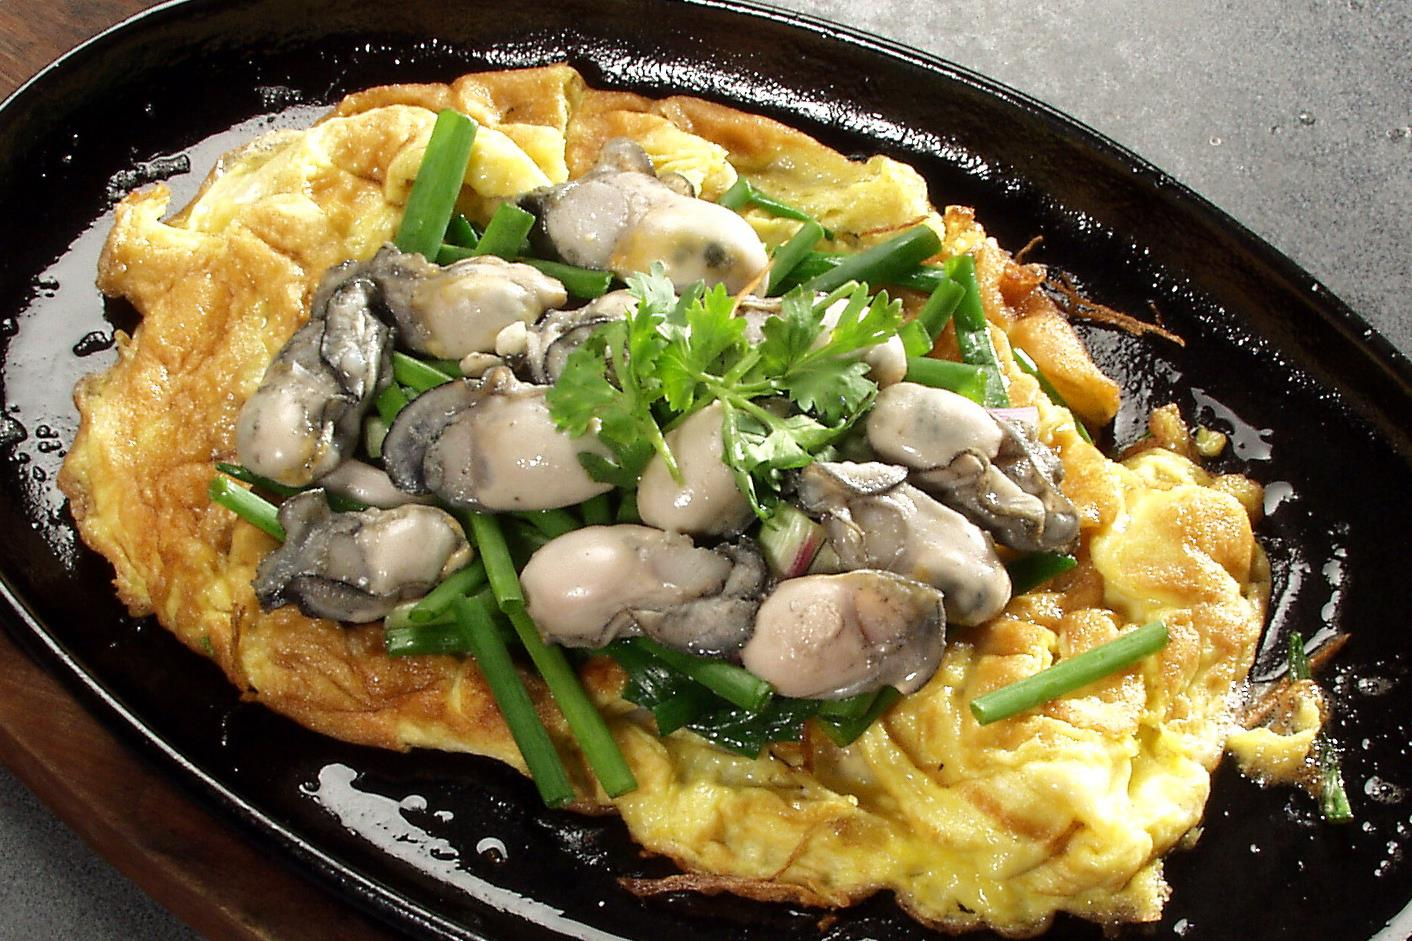 Omelette, Beancurd, Fried Items 蛋 , 豆腐 , 小吃